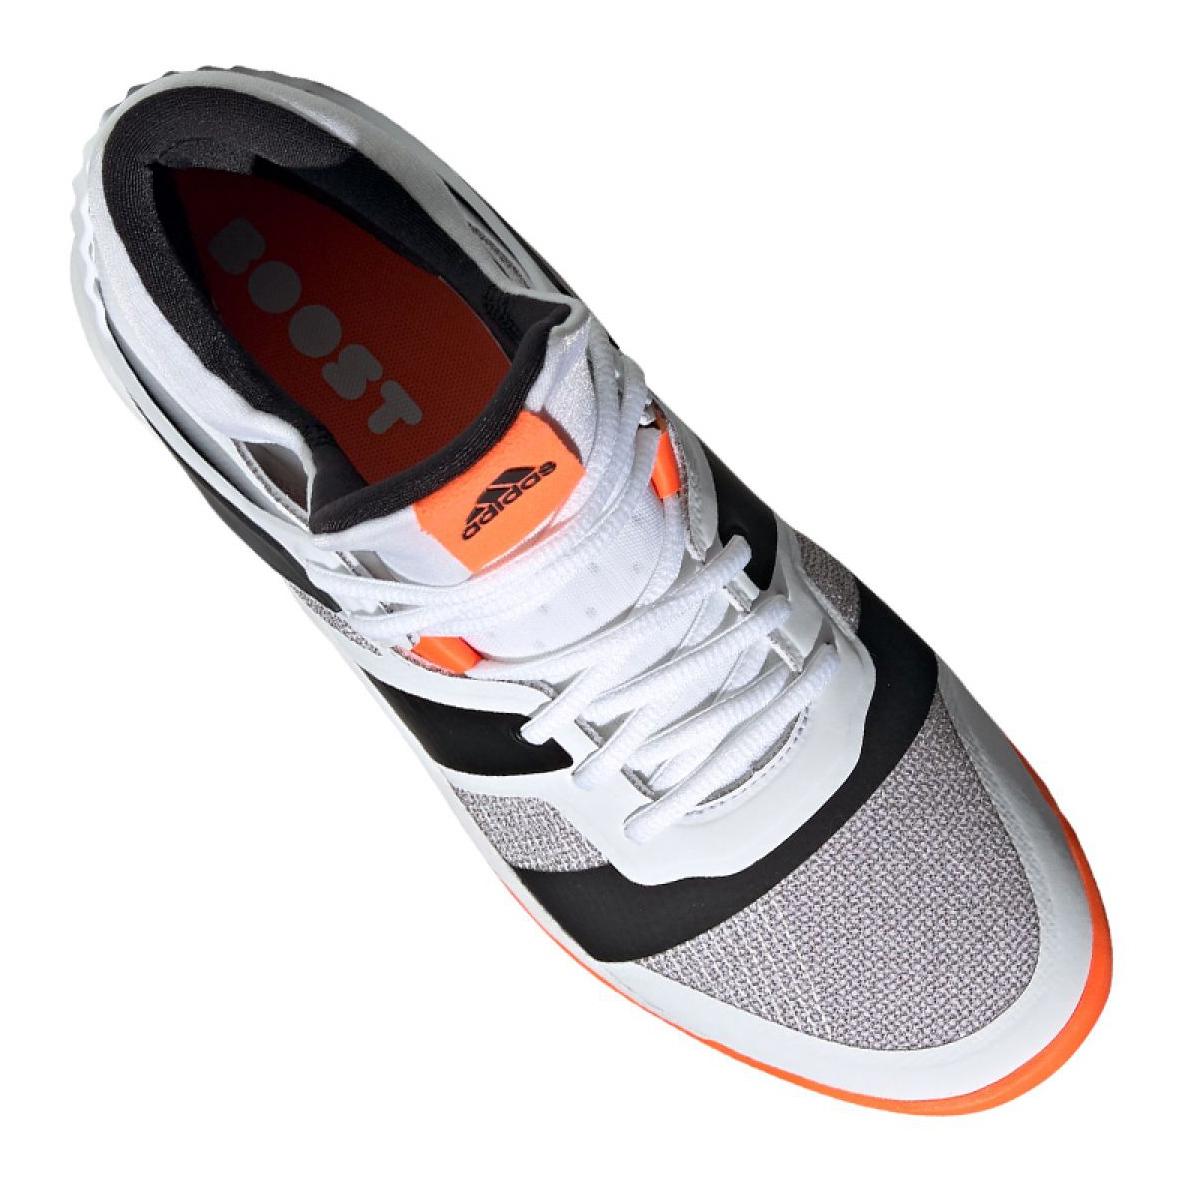 sports shoes c10d1 338a9 Buty adidas Stabil X Mid M F33827